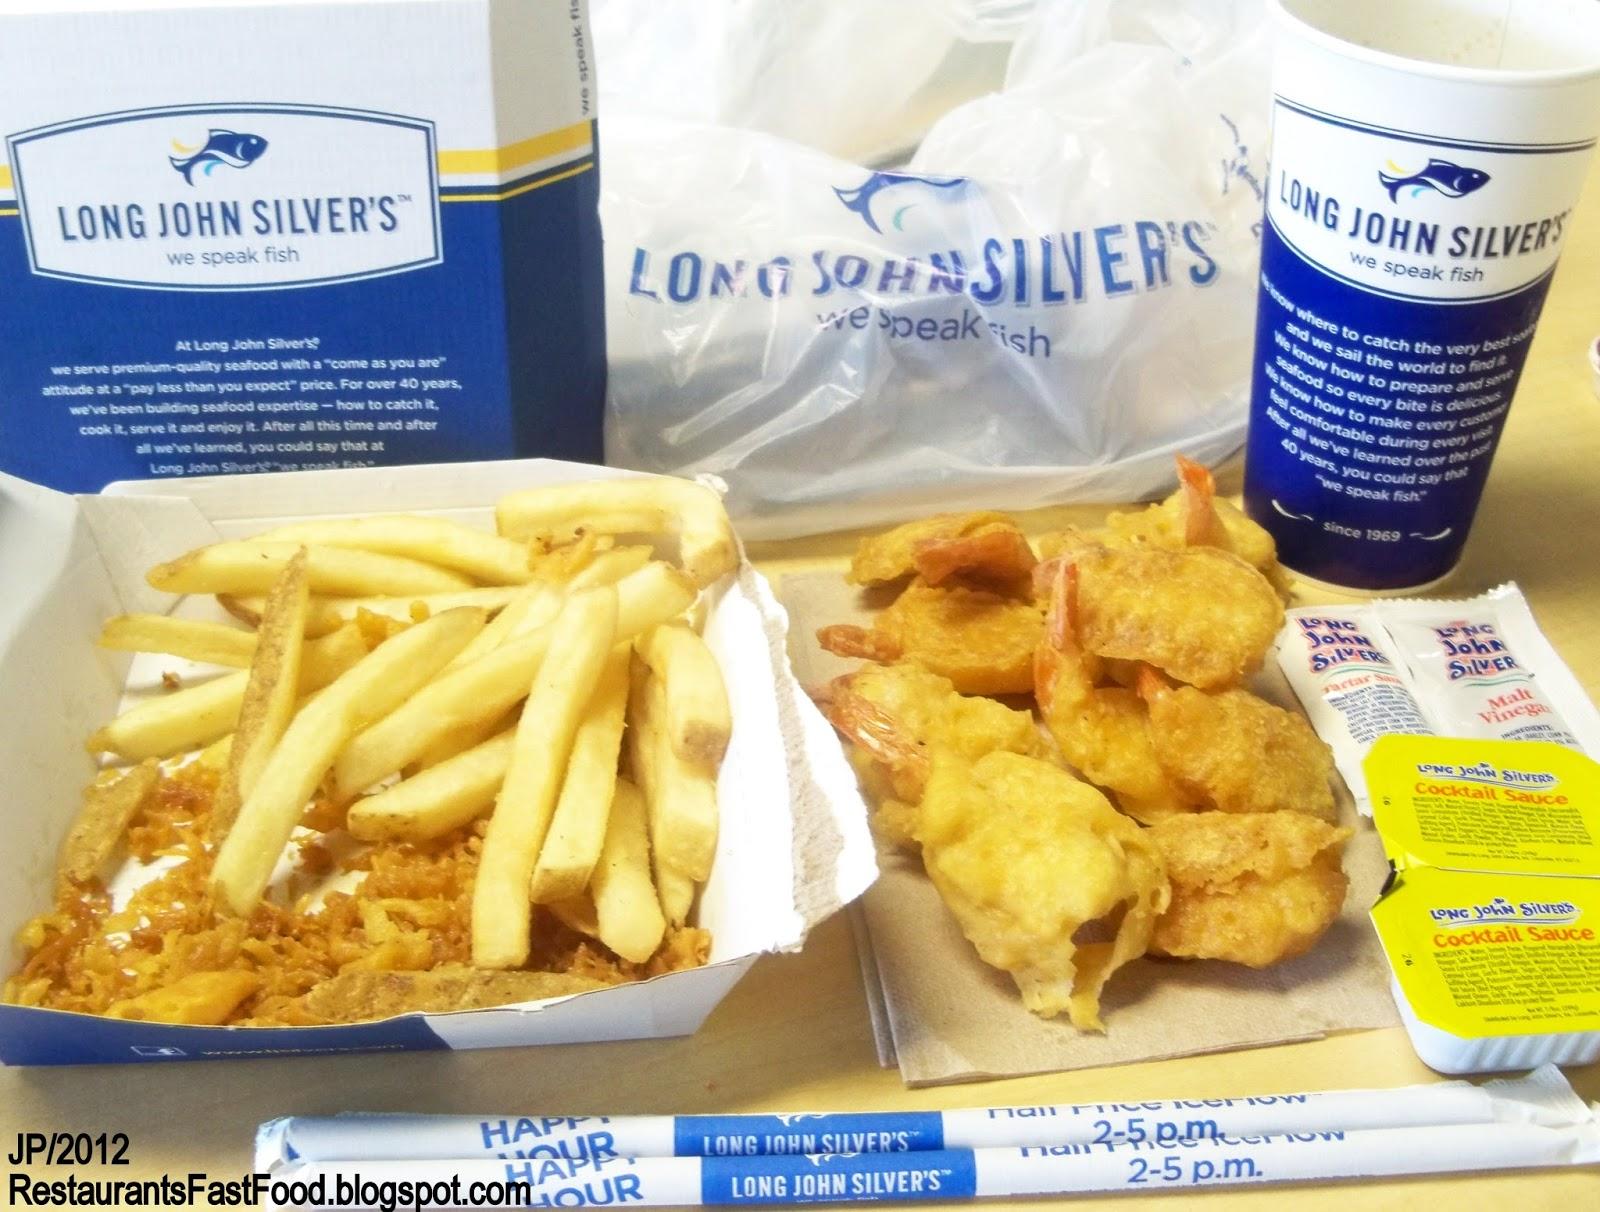 Thomson georgia mcduffie restaurant attorney bank dr for Fast food fish restaurants